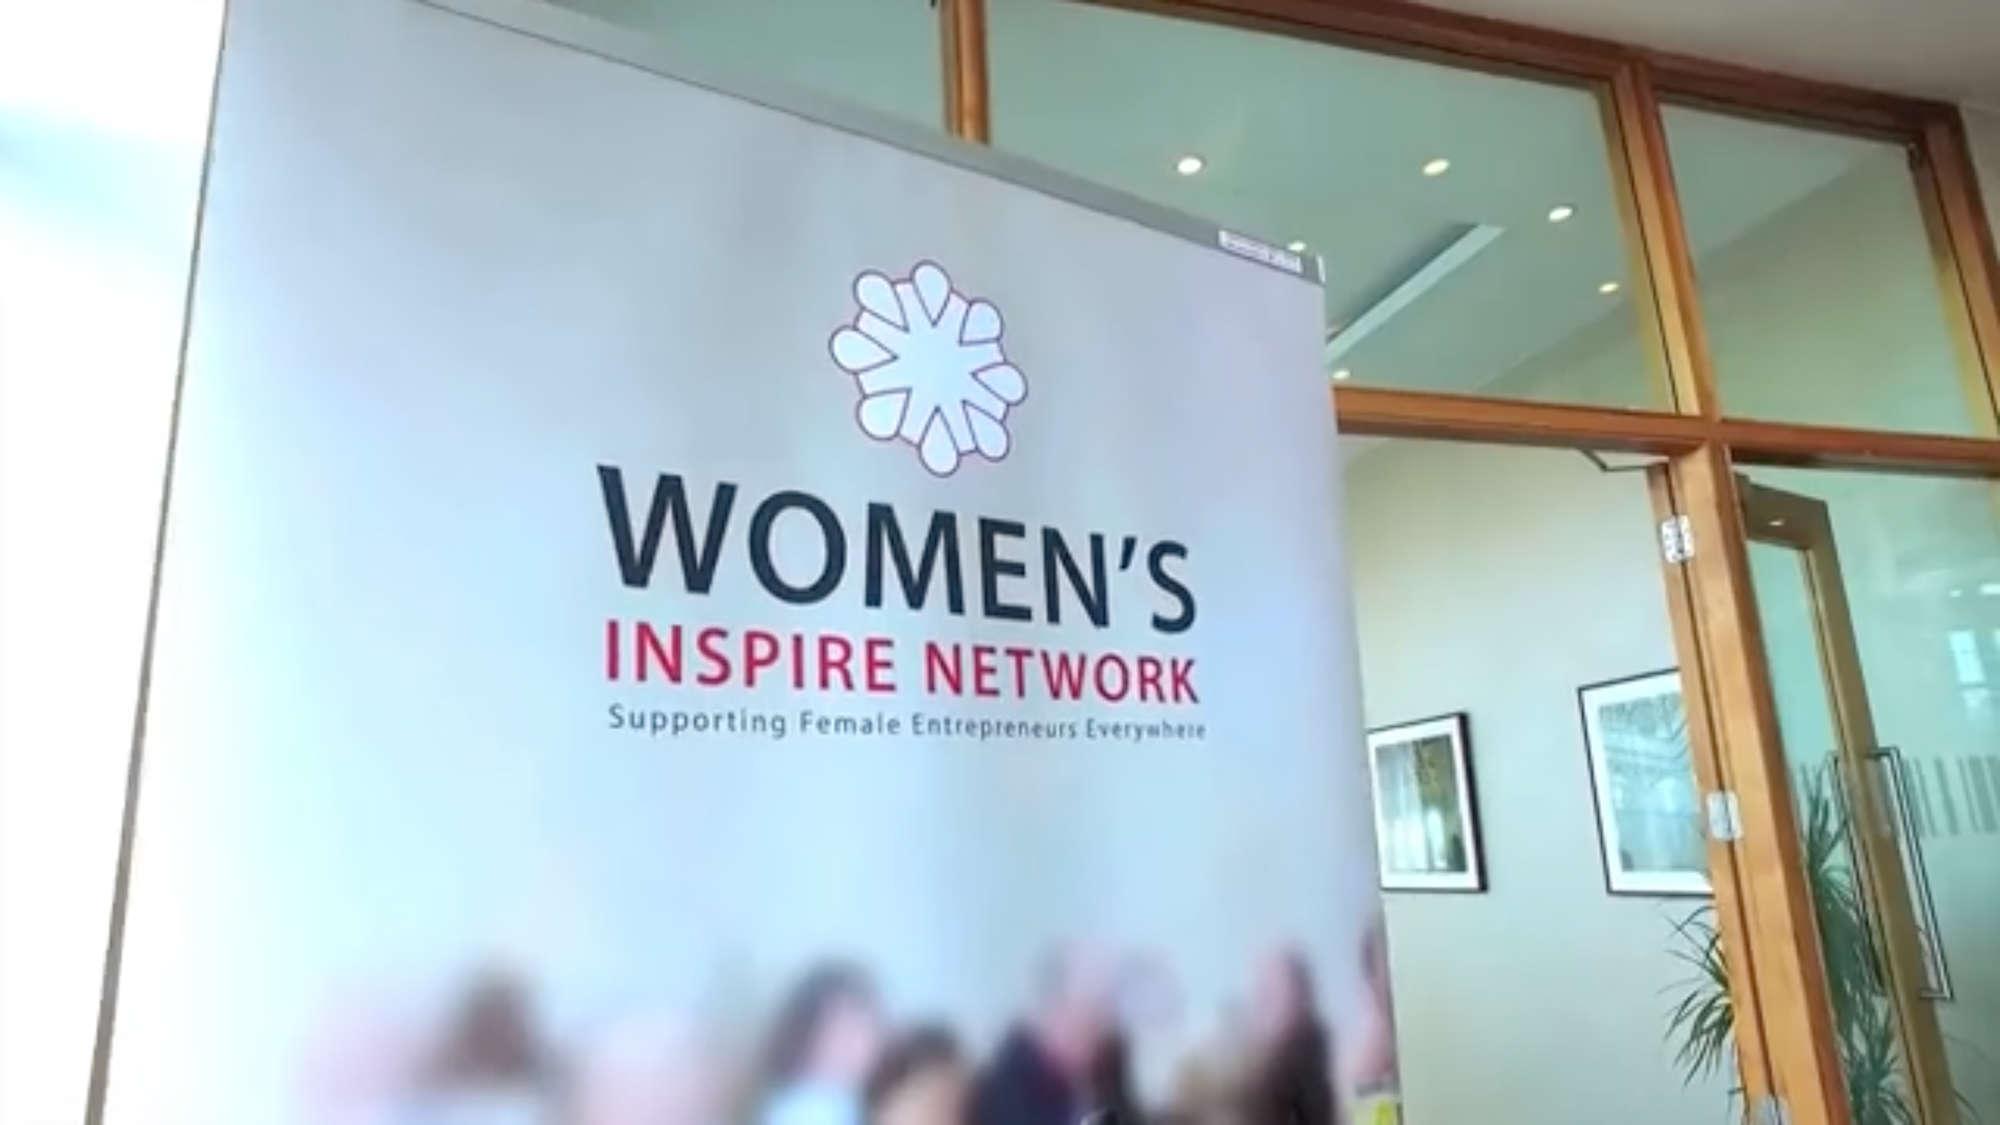 Women's Inspire Network video image